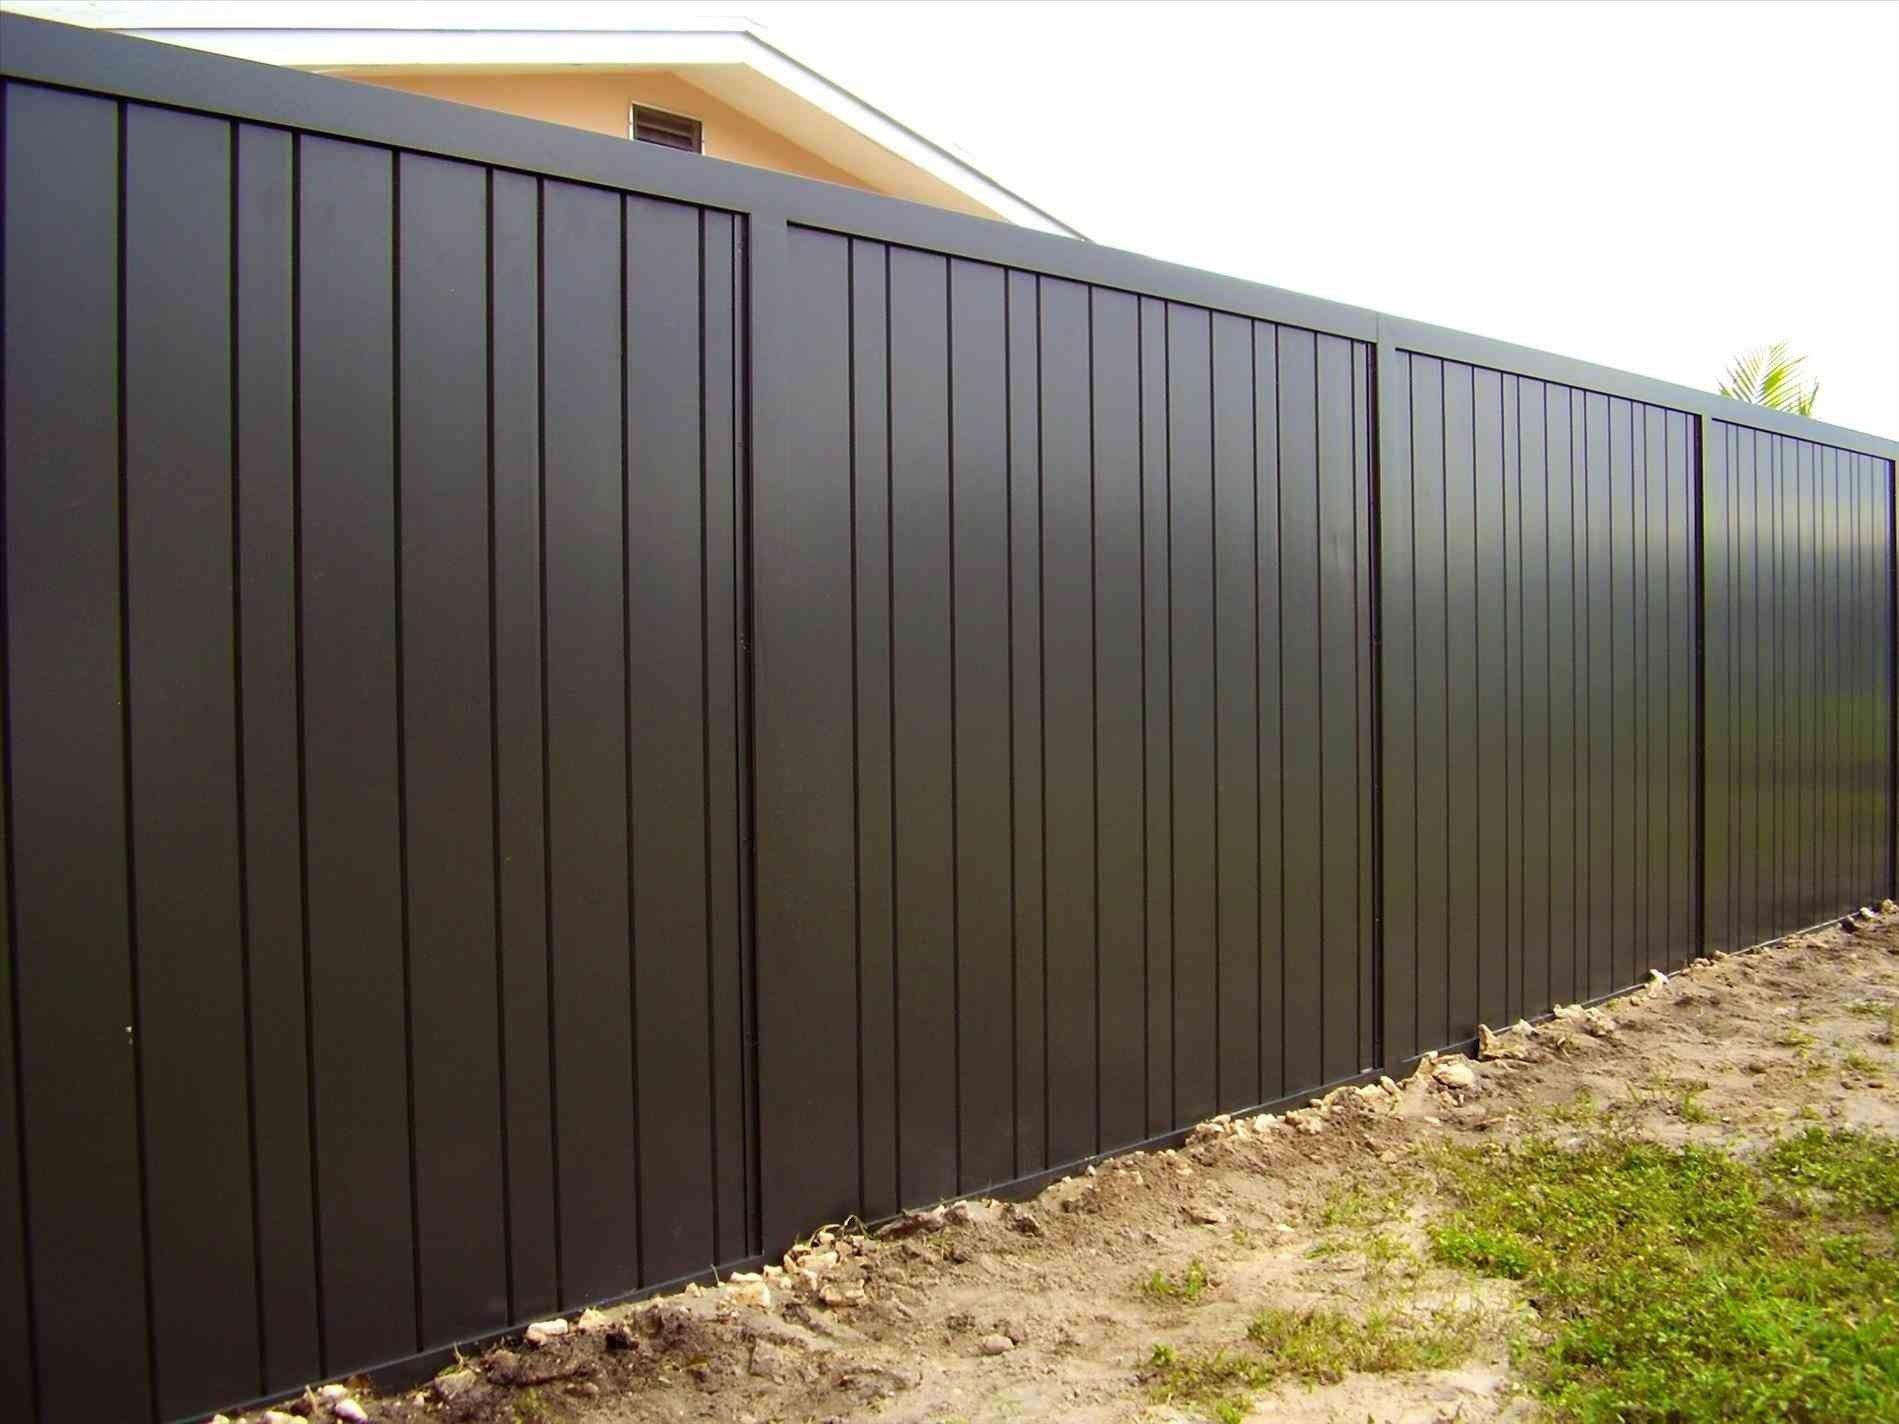 Phantasy Black Corrugated Metal Fence Panels Spectacular